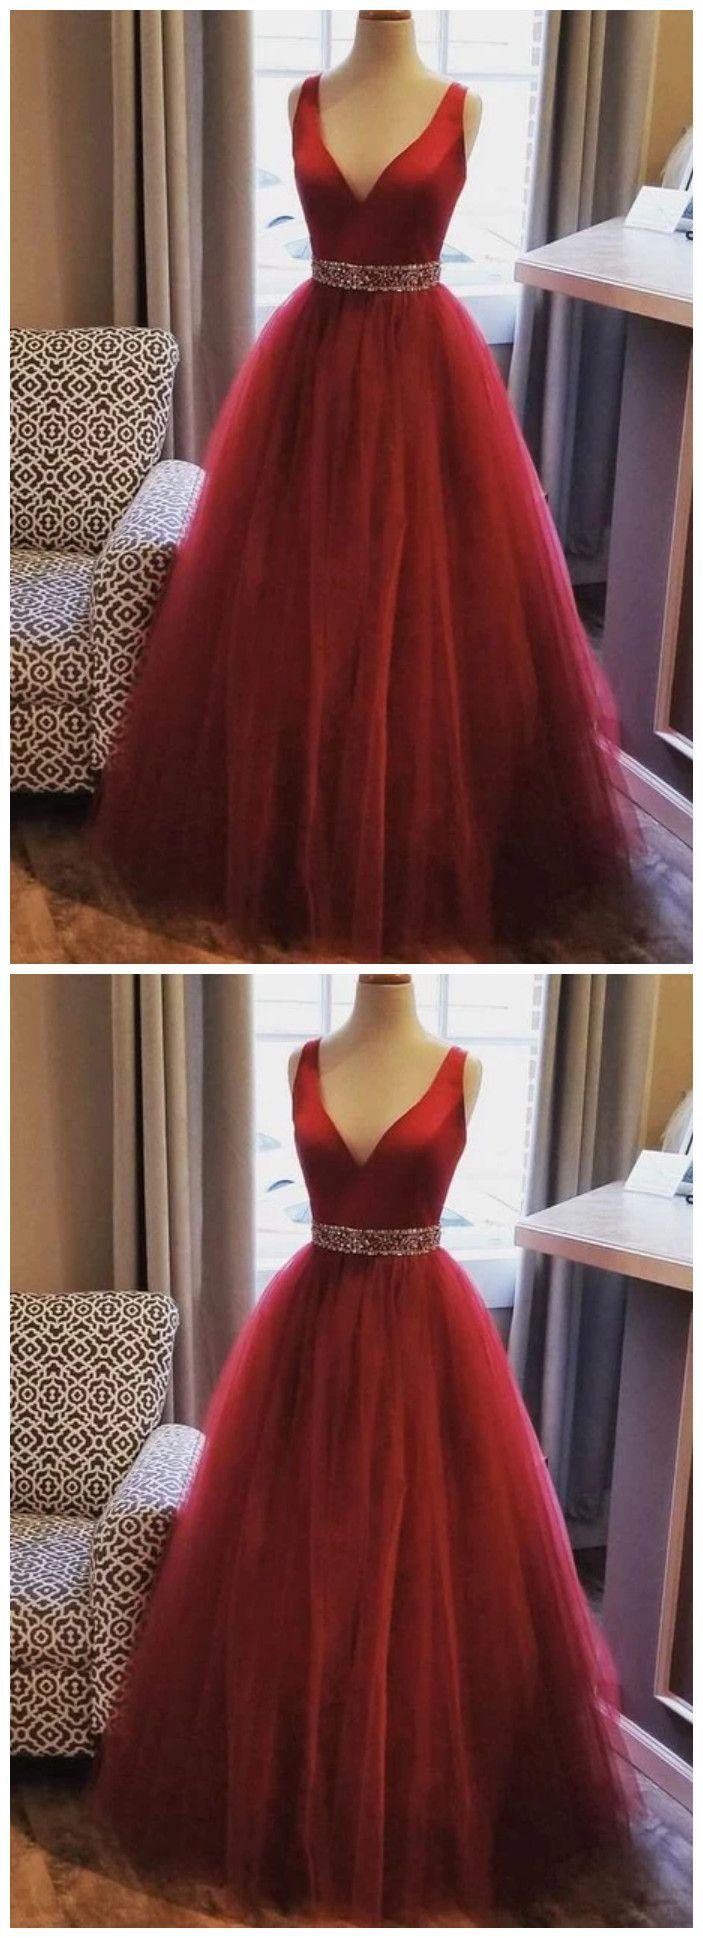 Gorgeous V Neck Wine Red Long Prom Dress Evening Gowns Prom Dresses Evening Dresses Prom Long Prom Dress [ 1938 x 703 Pixel ]